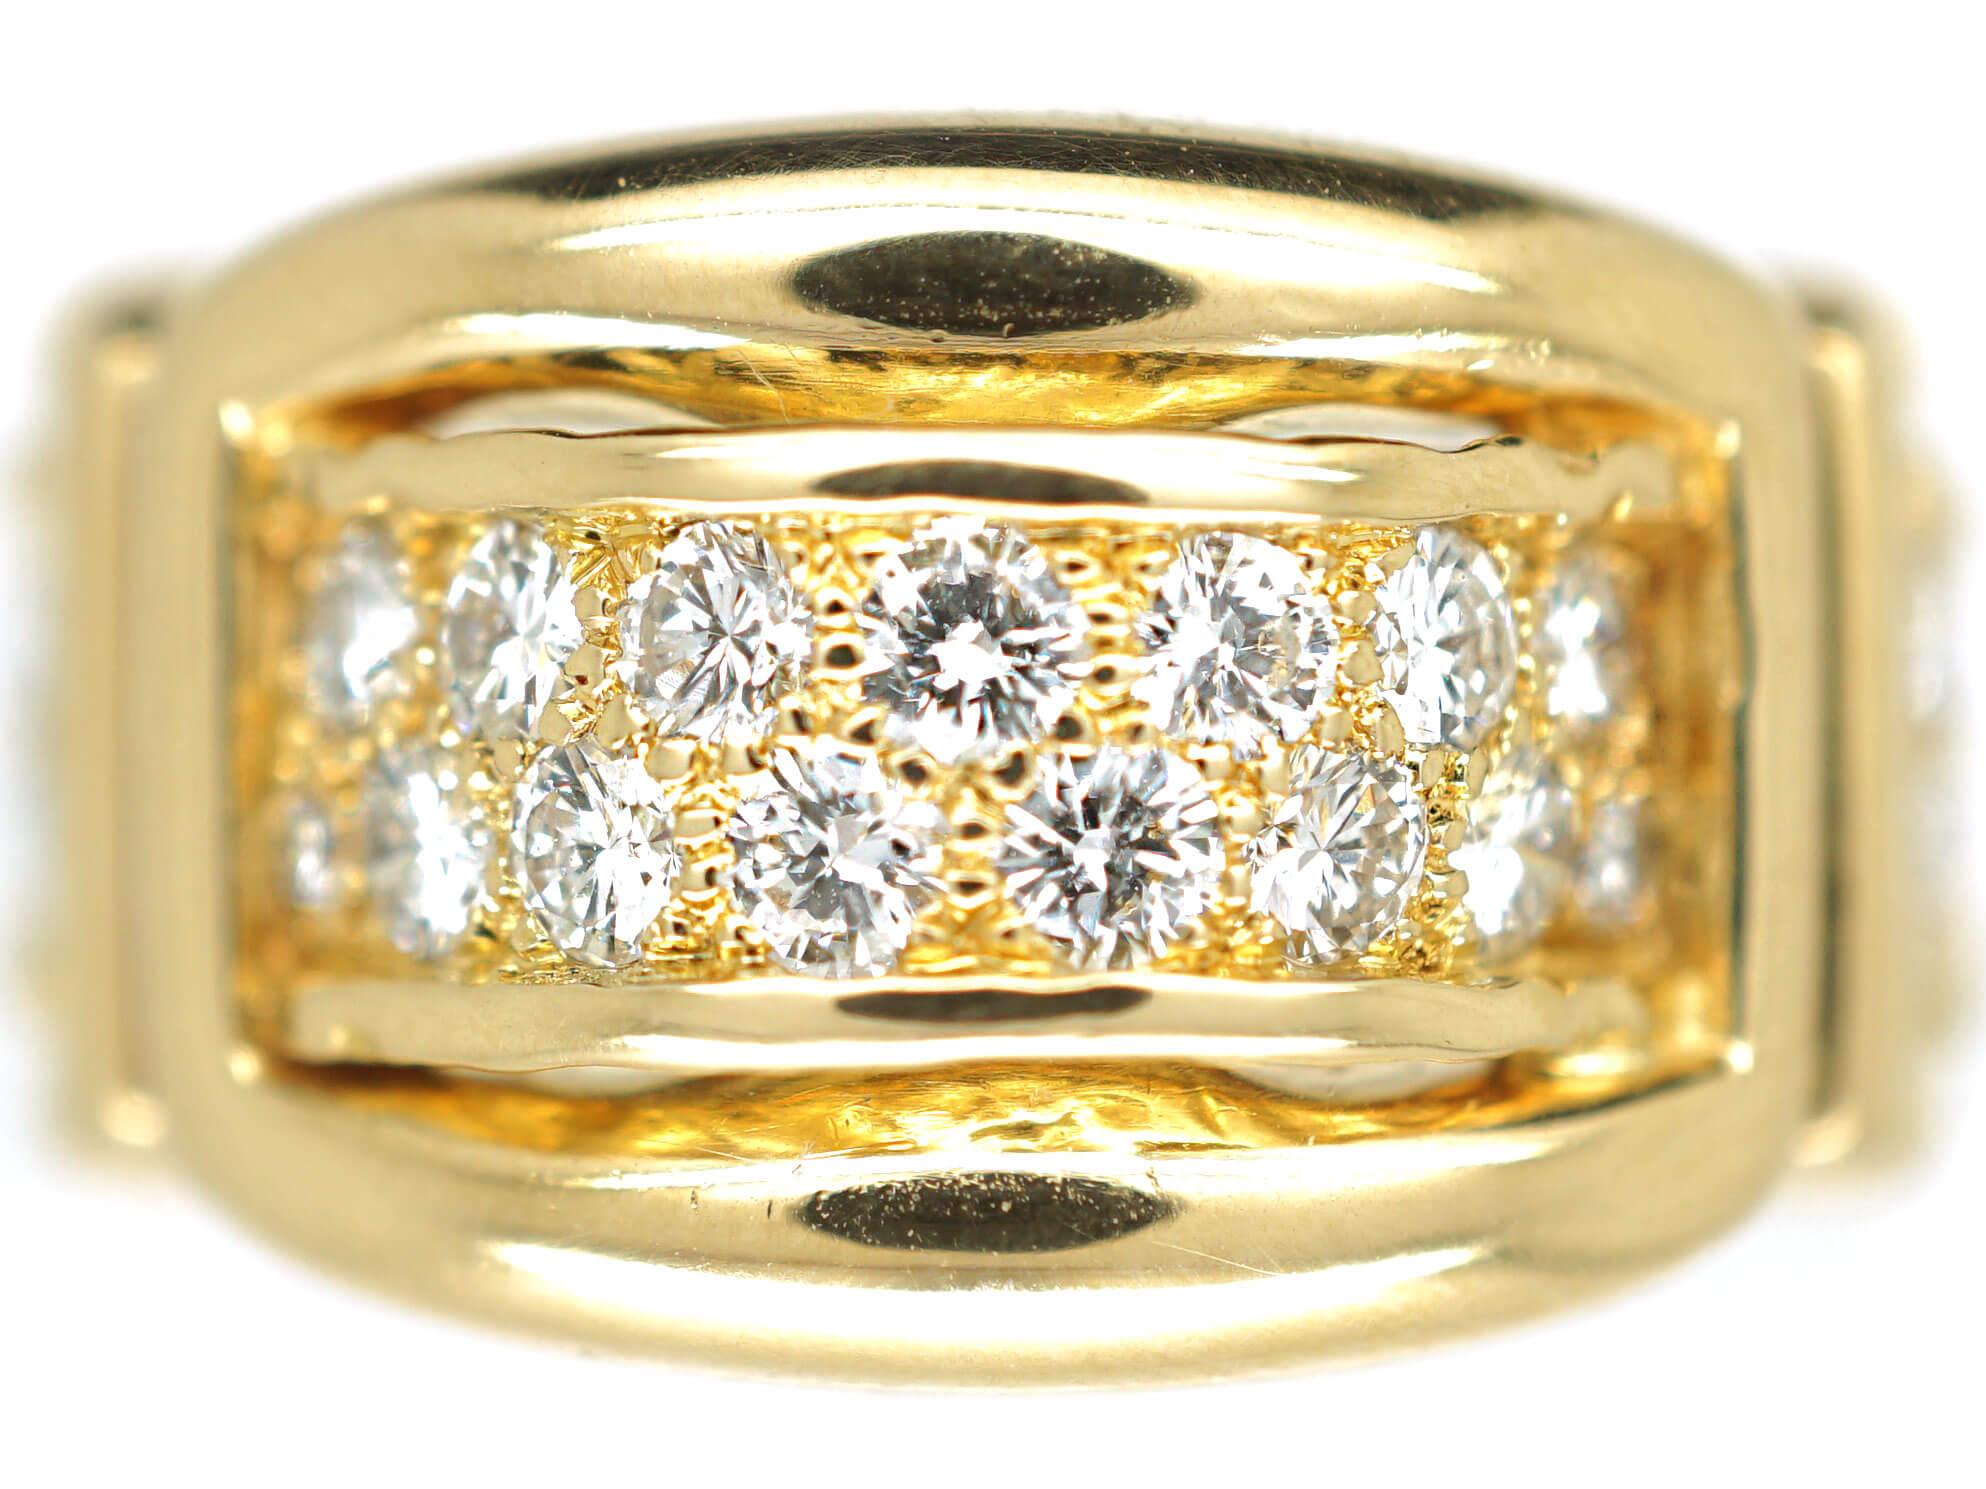 18ct Gold & Diamond Ring by Asprey of London